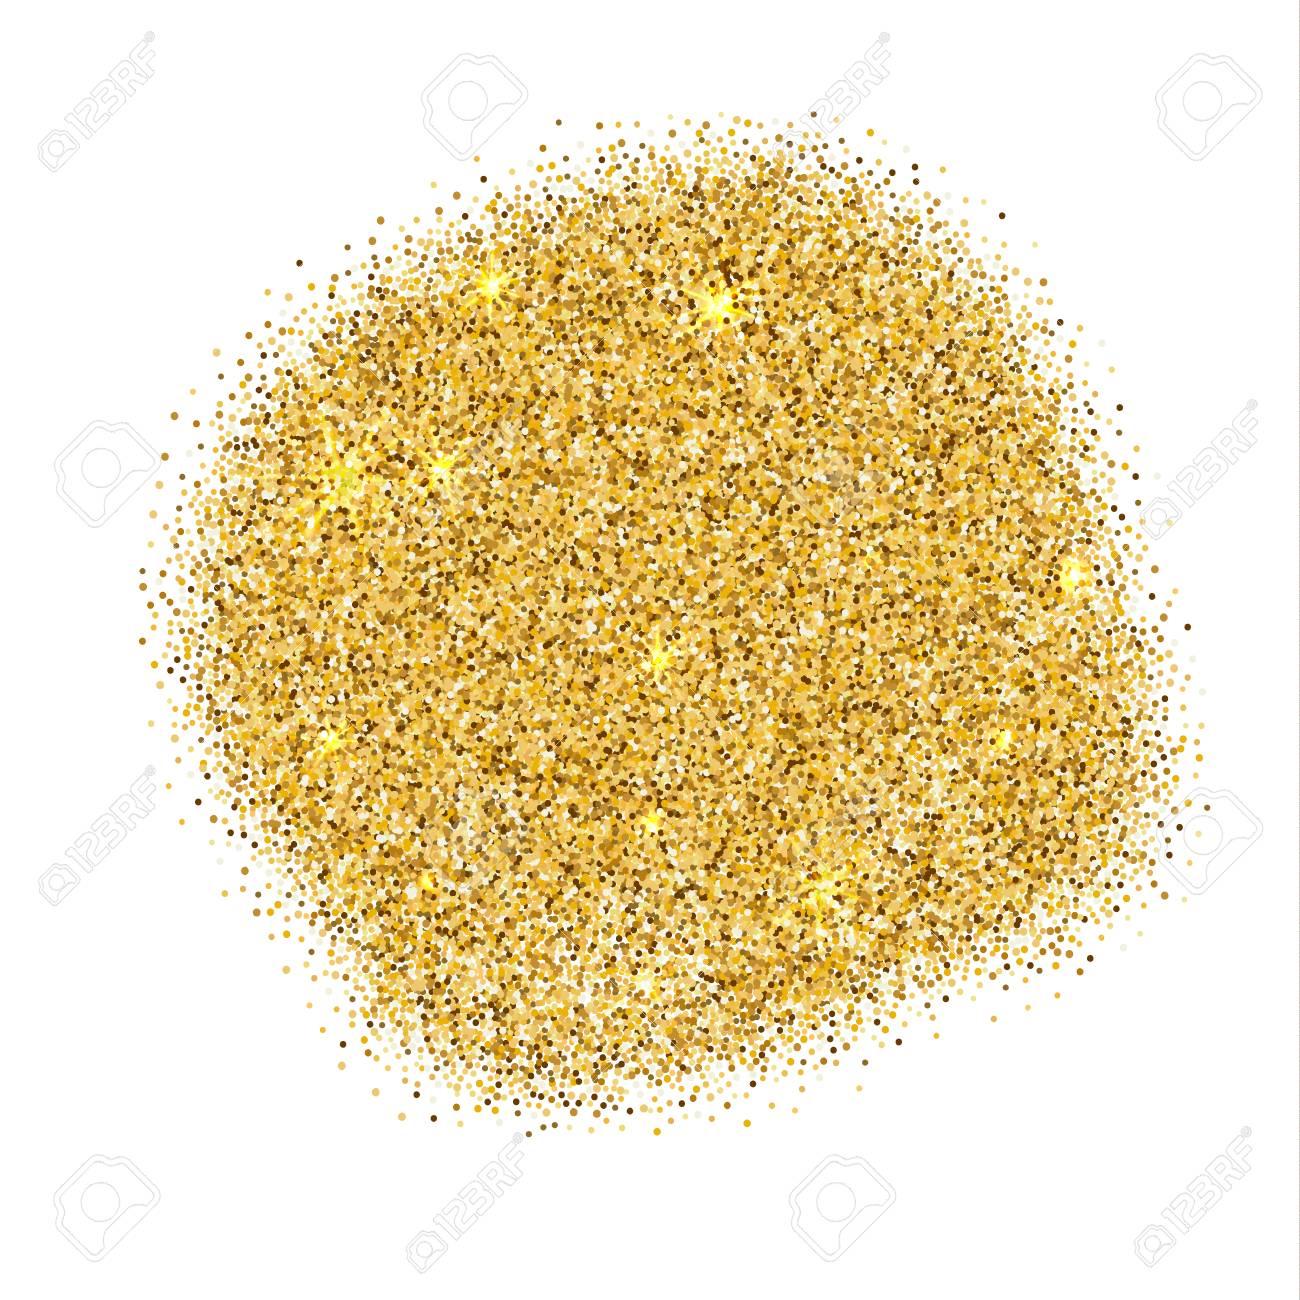 Gold sparkles on white background. Gold glitter background. - 122526507